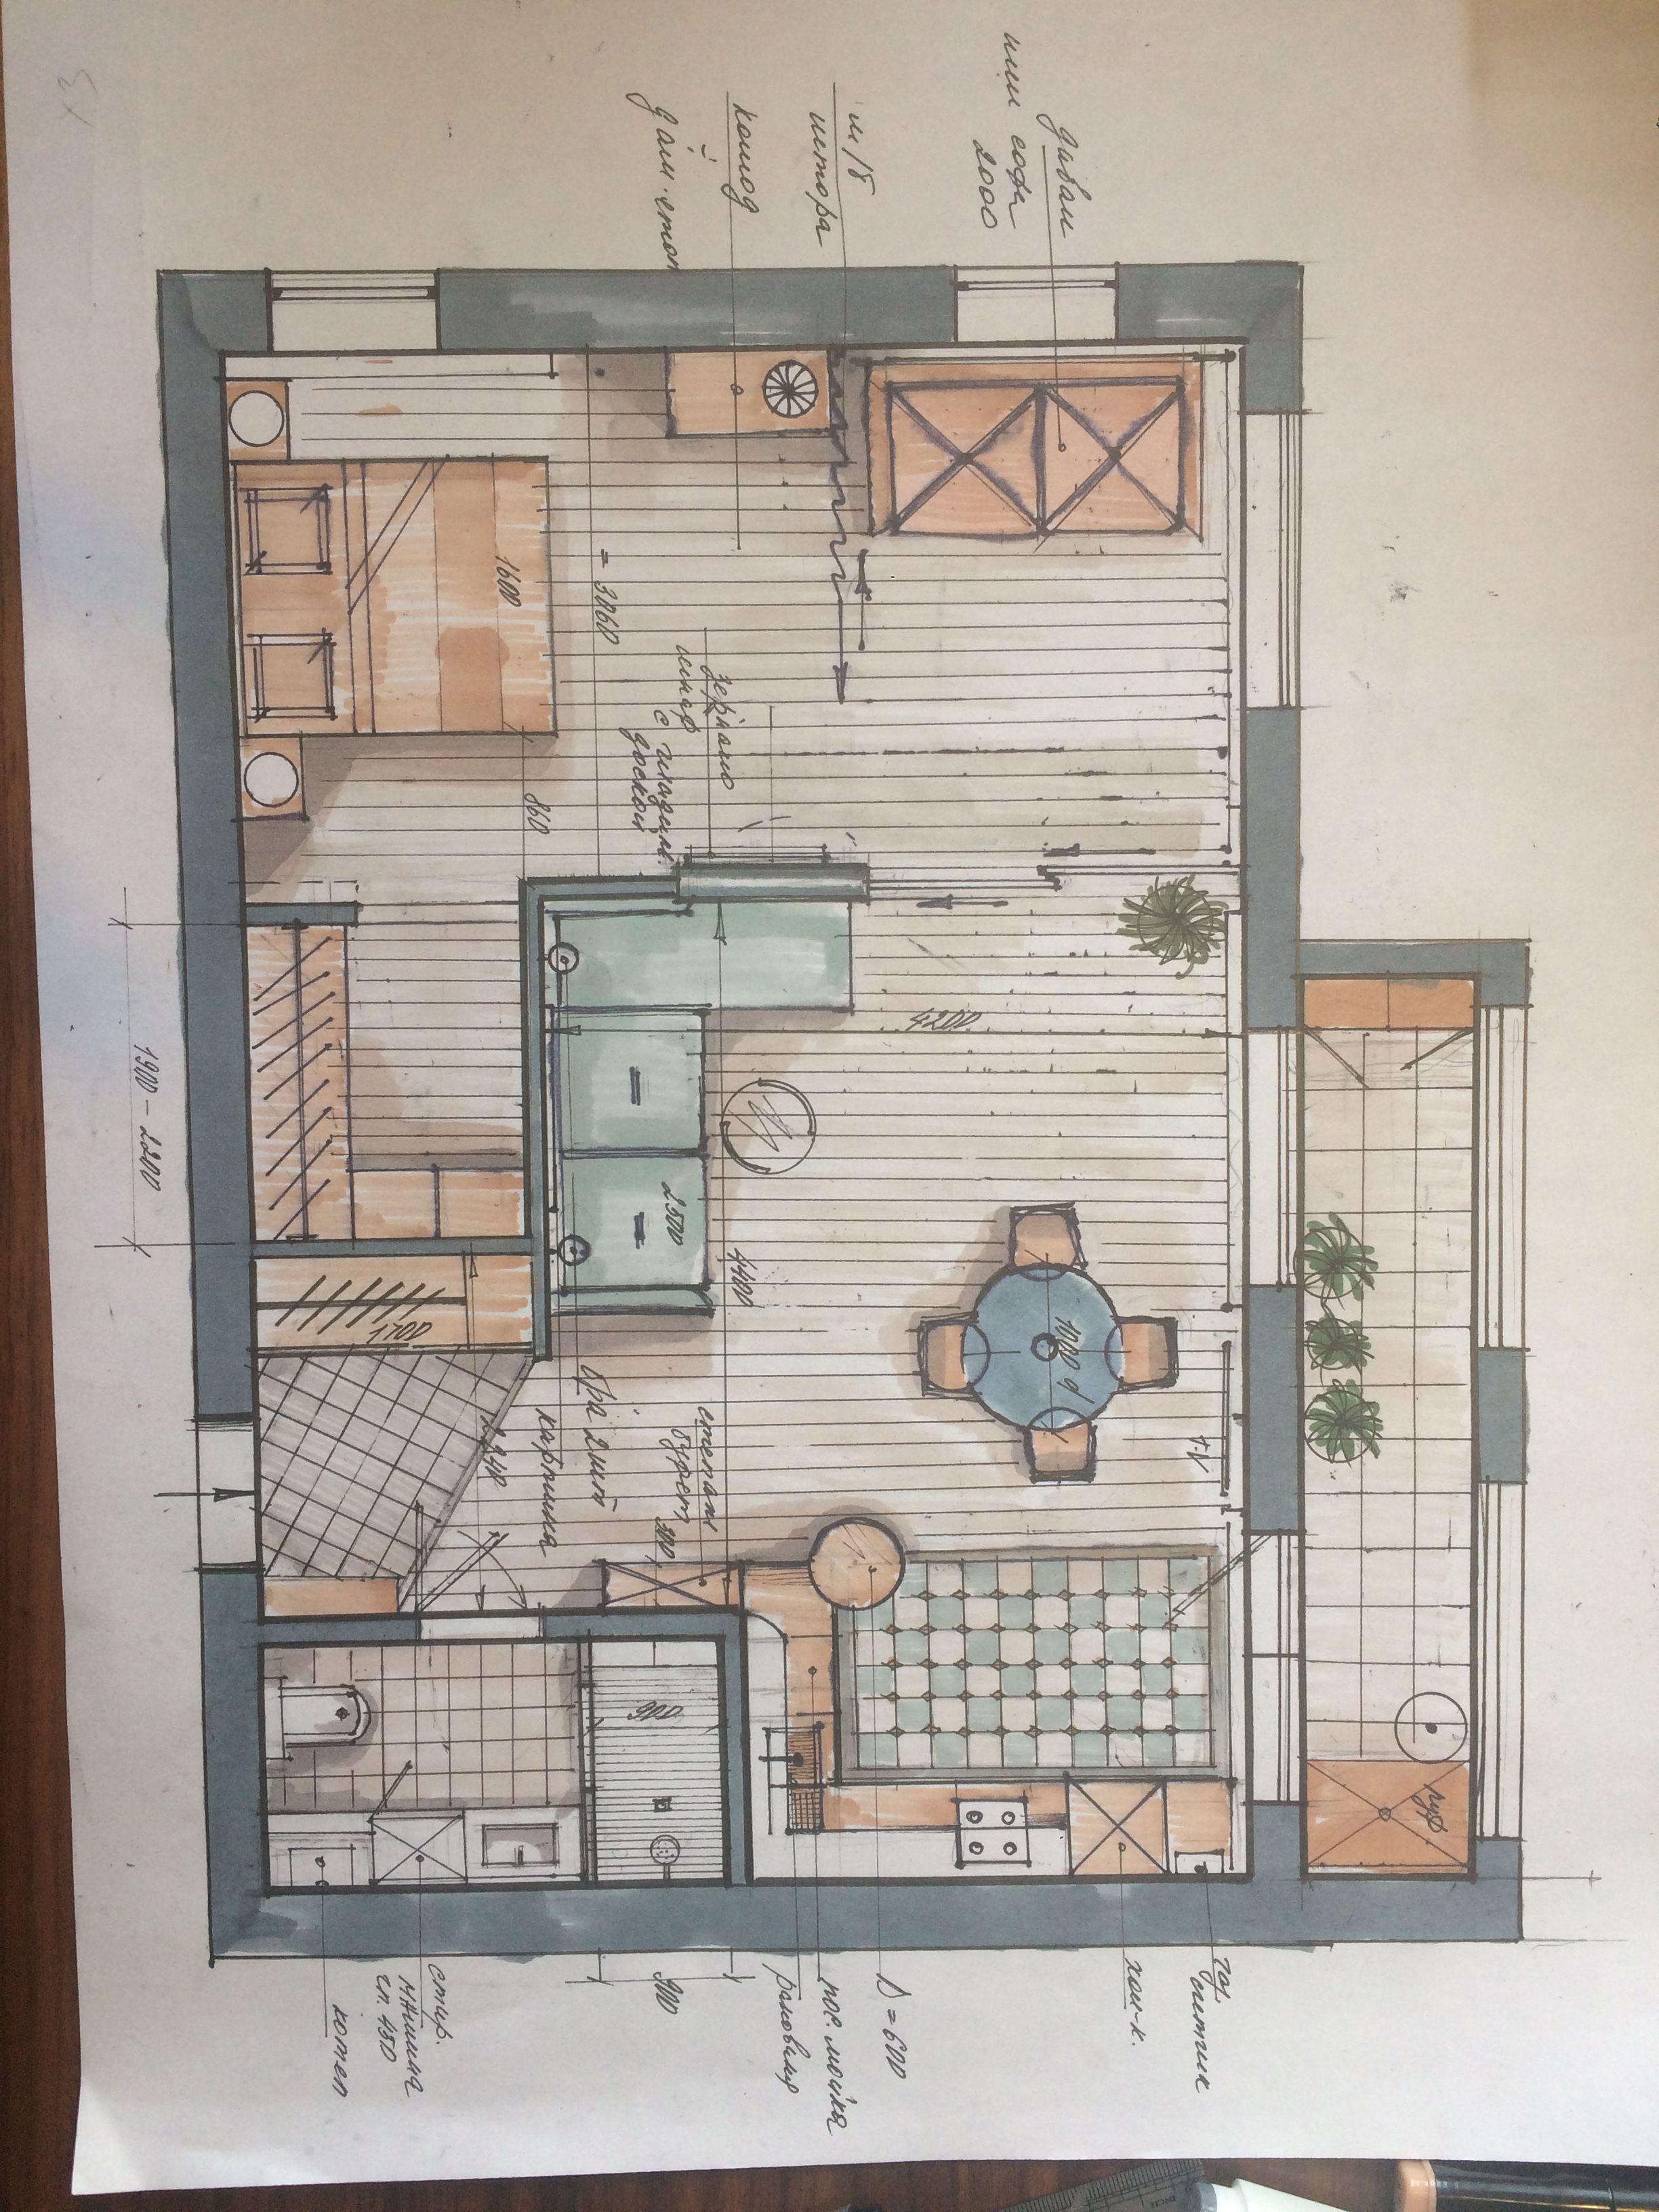 Pin by probal malakar on architectural sketches planos for Ponteggio ceta dwg